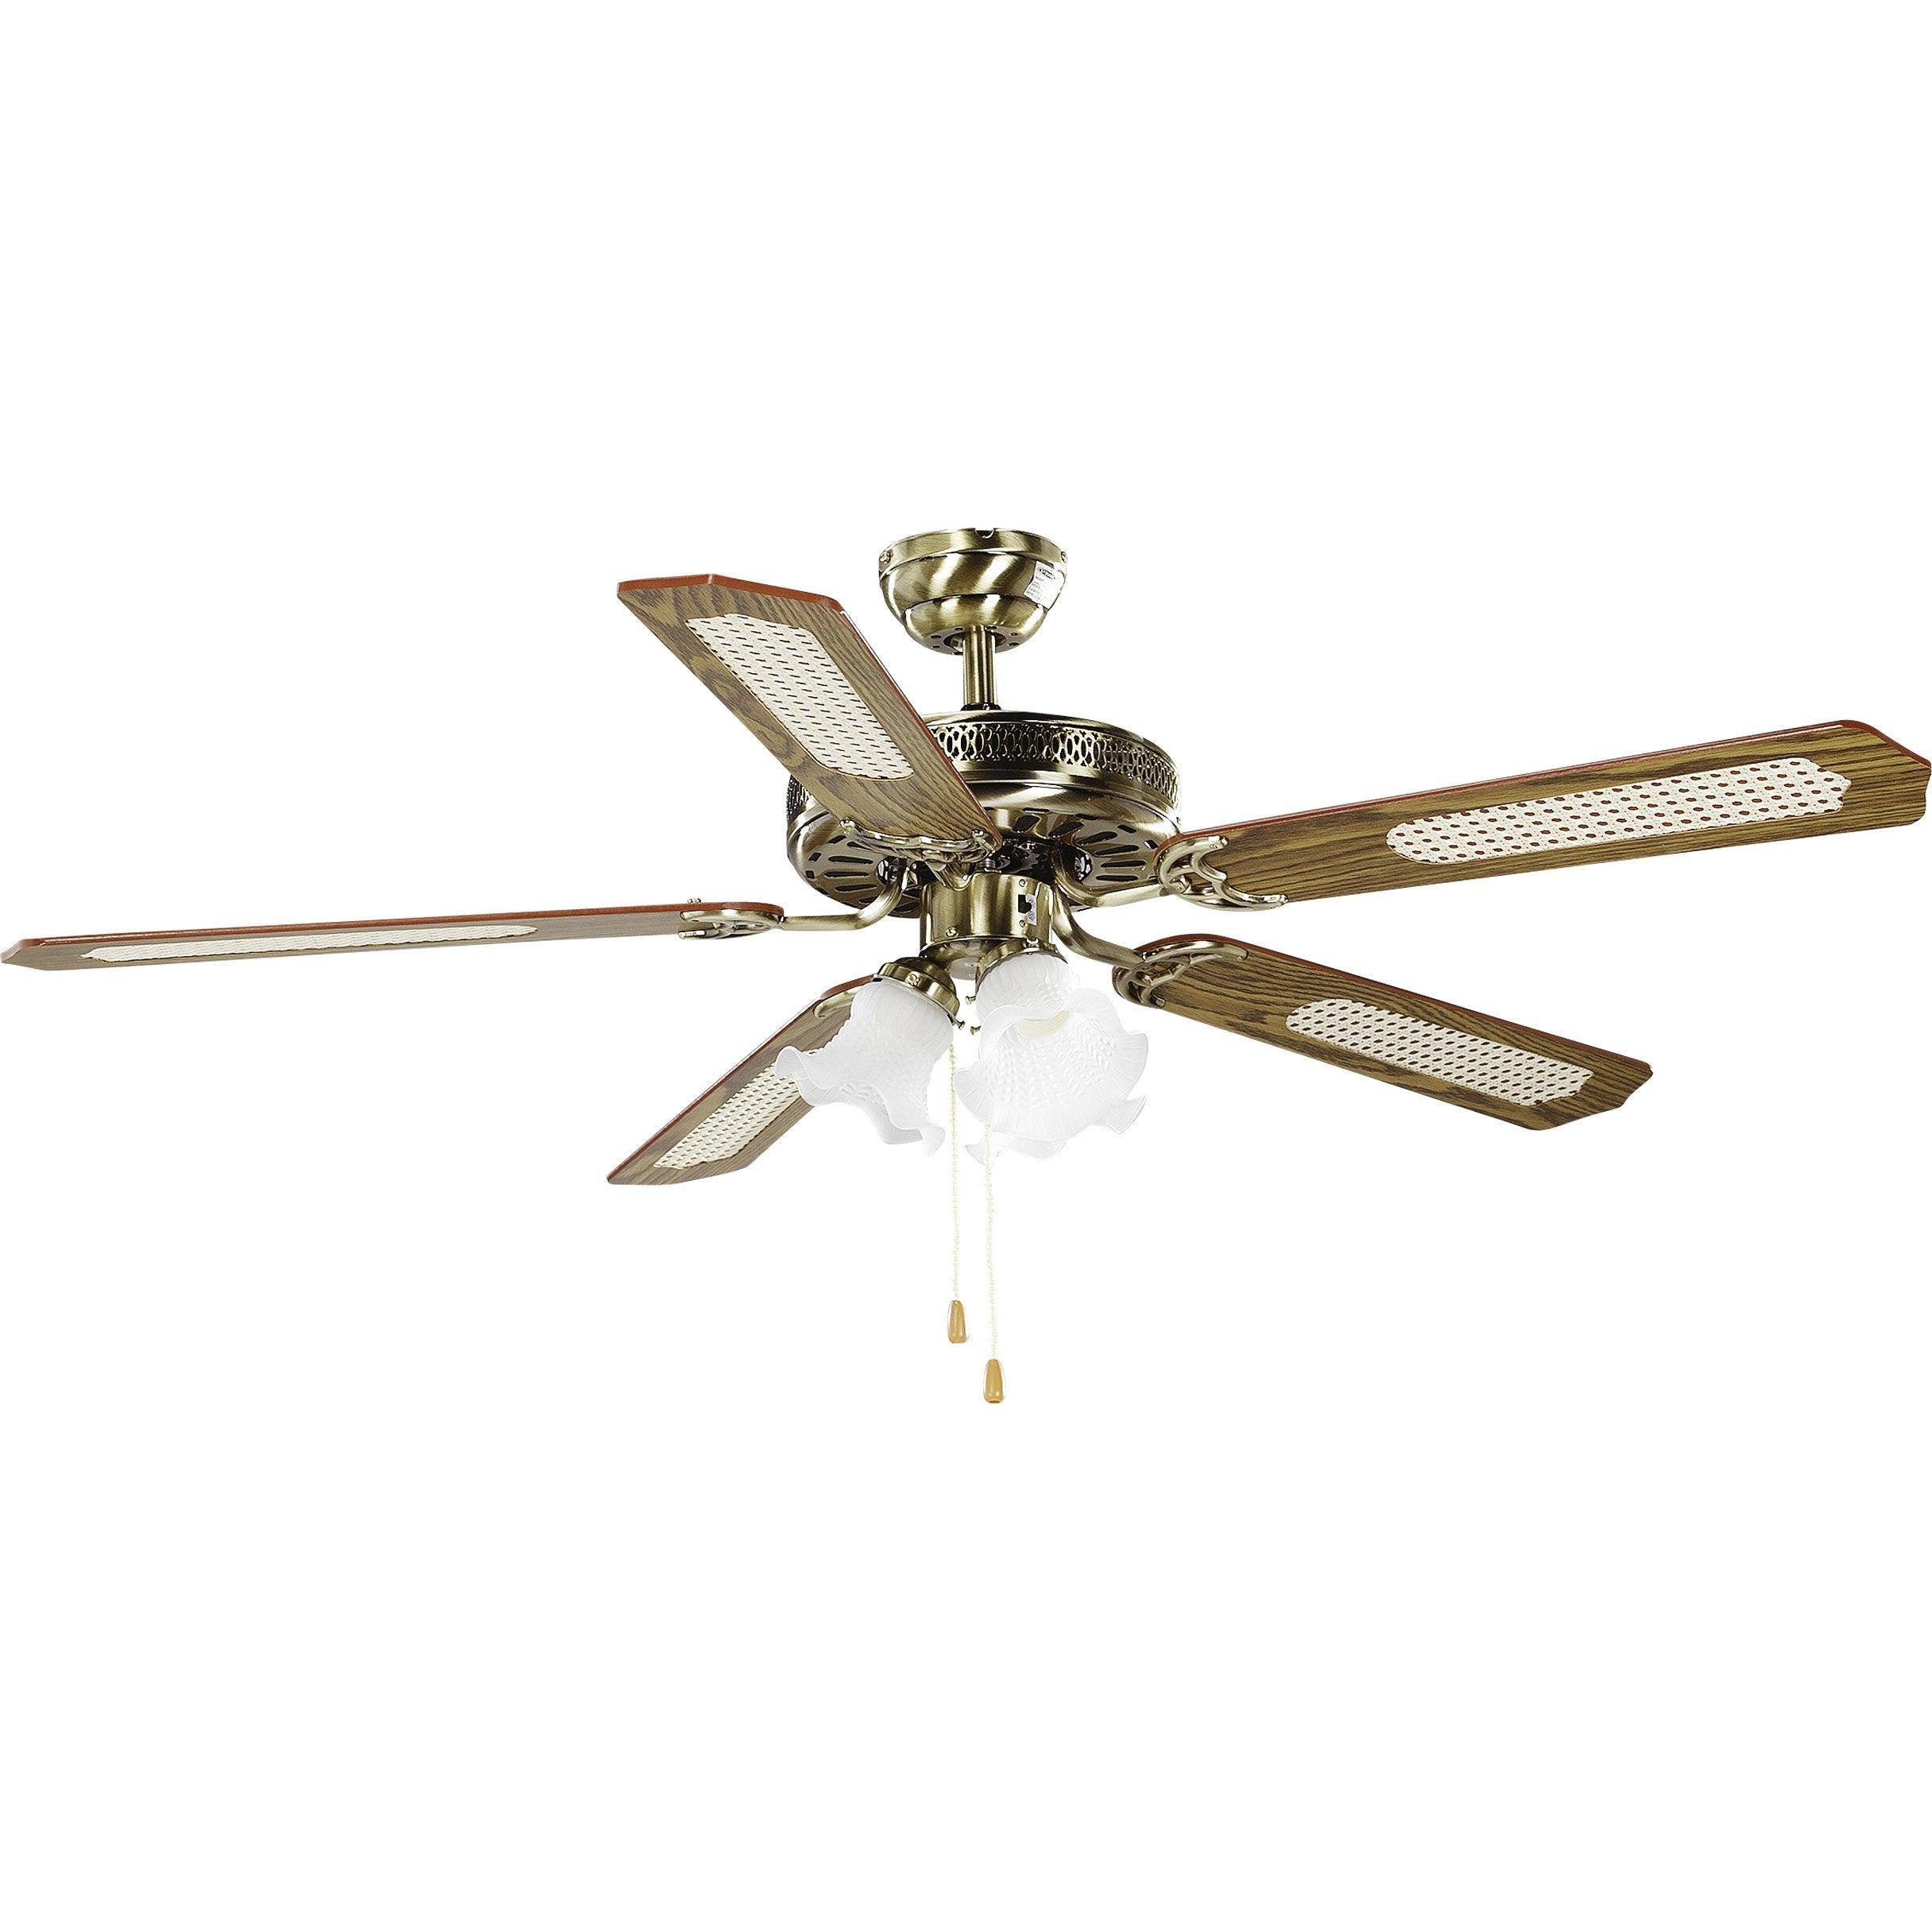 Kit equilibrage ventilateur plafond leroy merlin